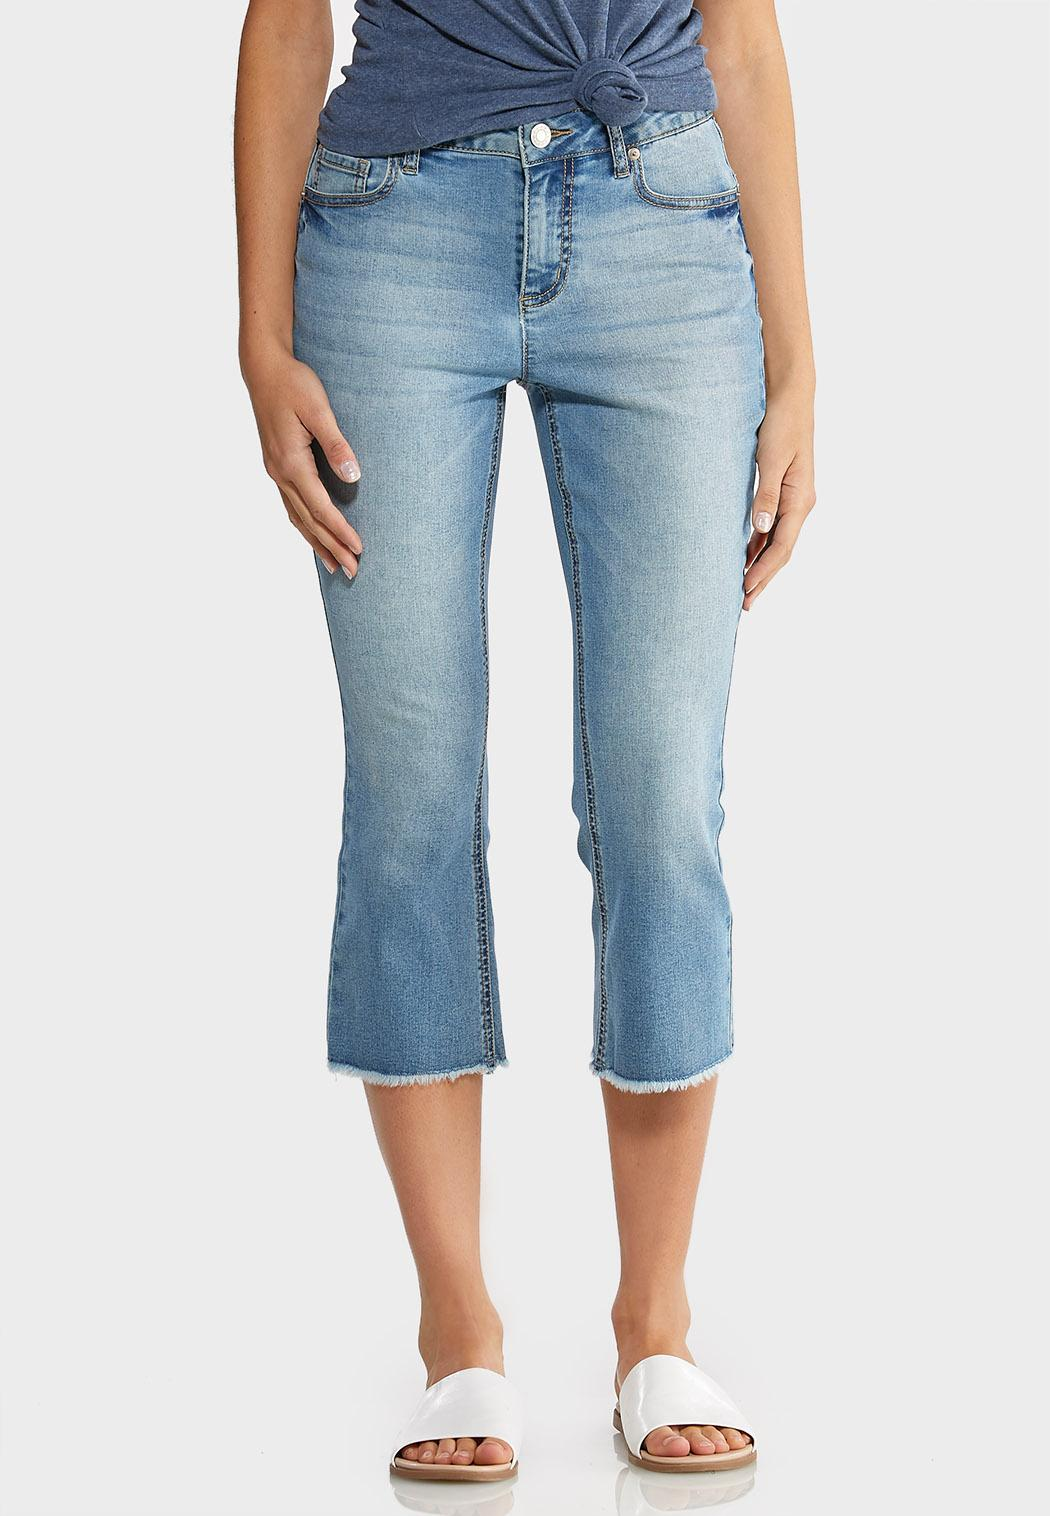 Cropped Raw Hem Jeans